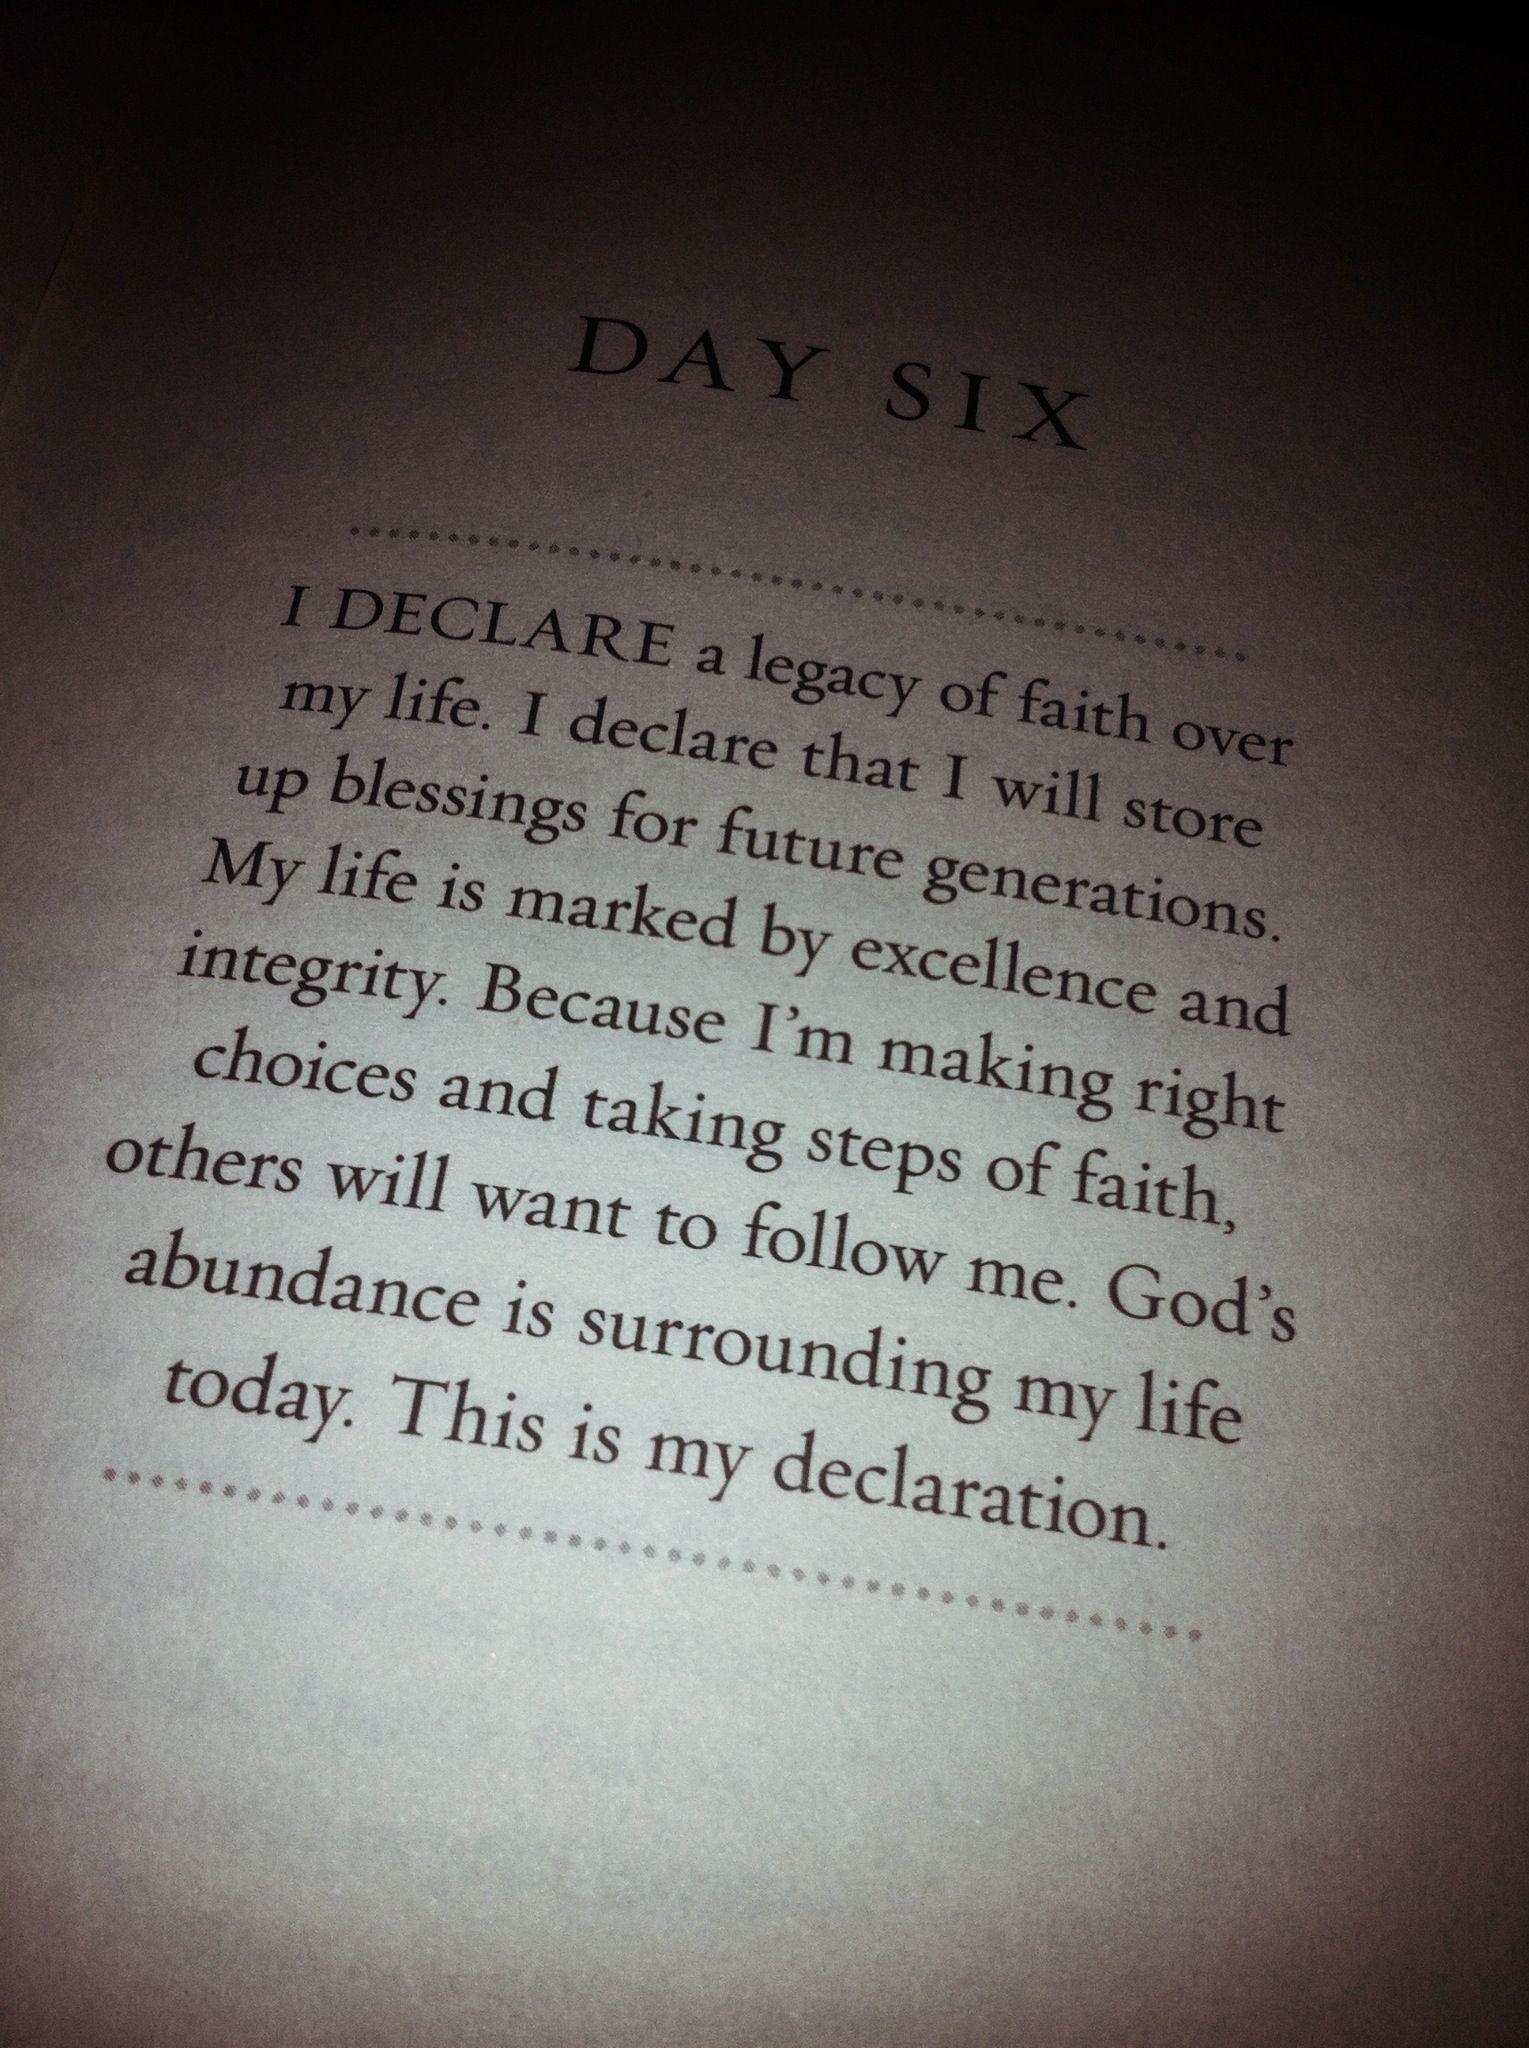 Joel Osteen Quotes On Love 31 Declarations To Speak Over Your Lifejoel Osteen Other